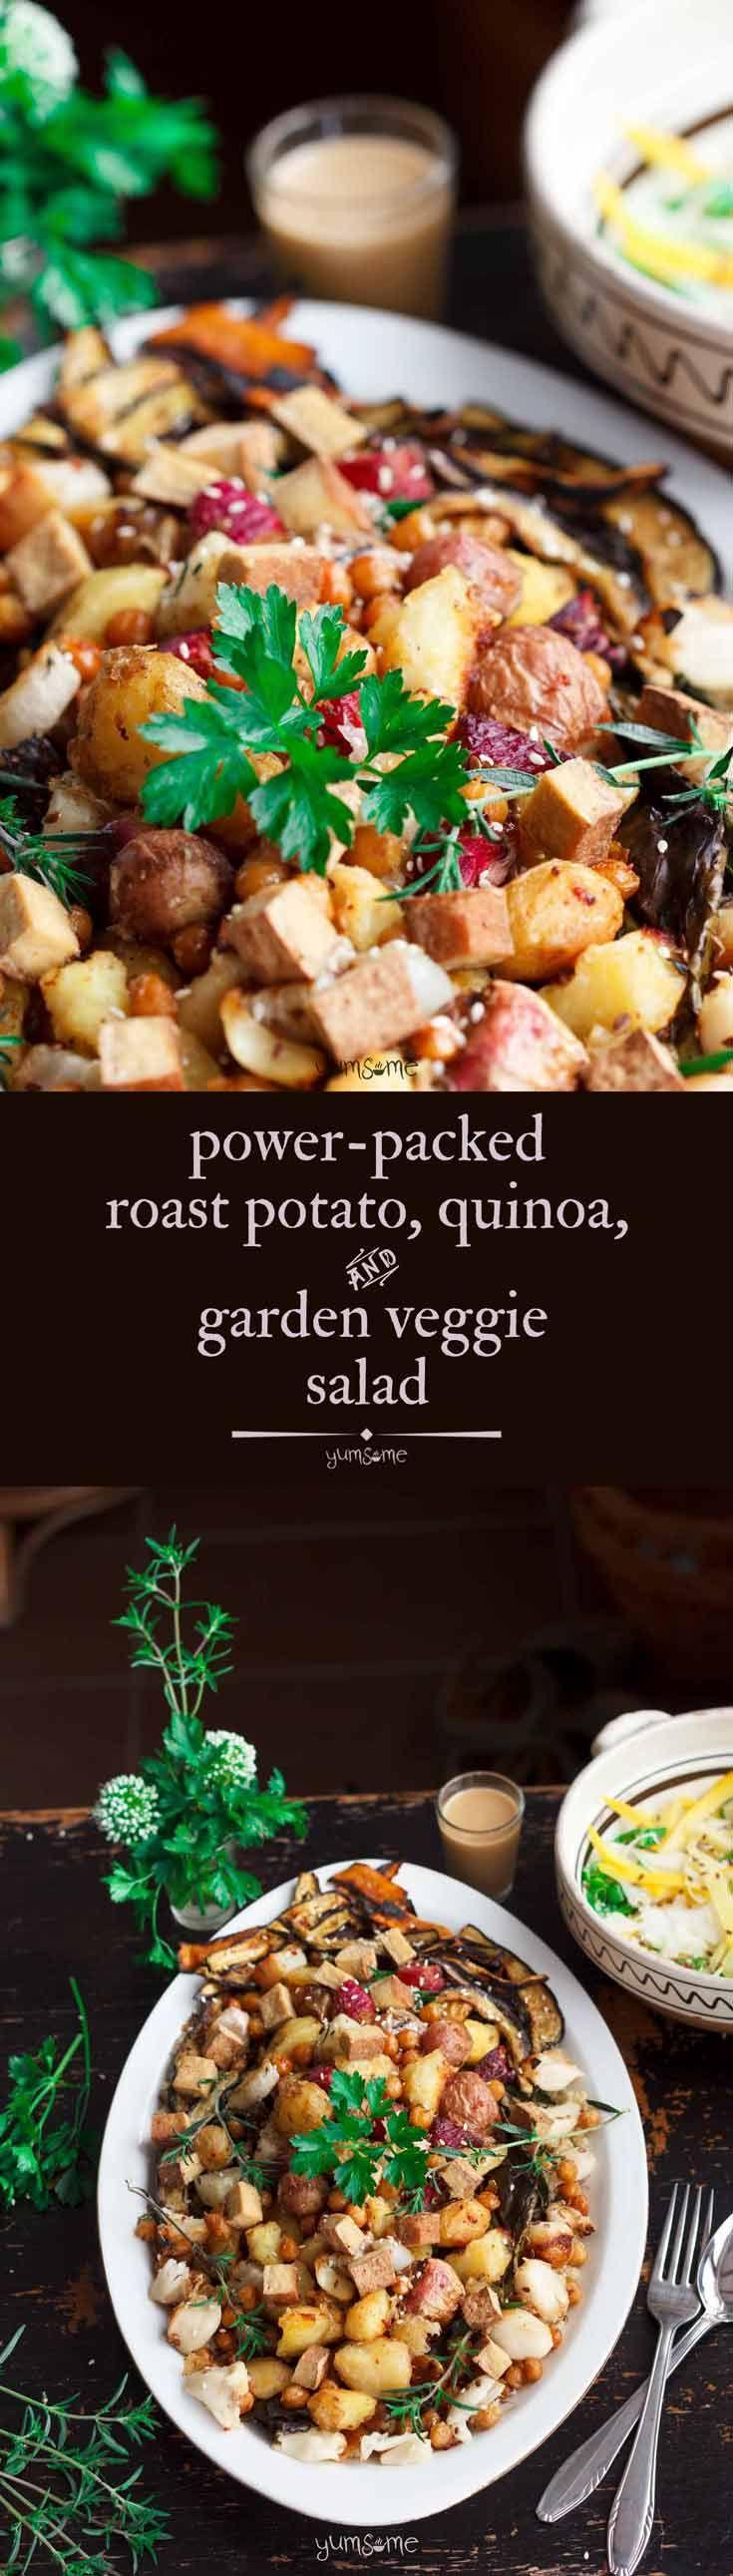 Power-Packed Roast Potato, Quinoa, and Garden Vegg…